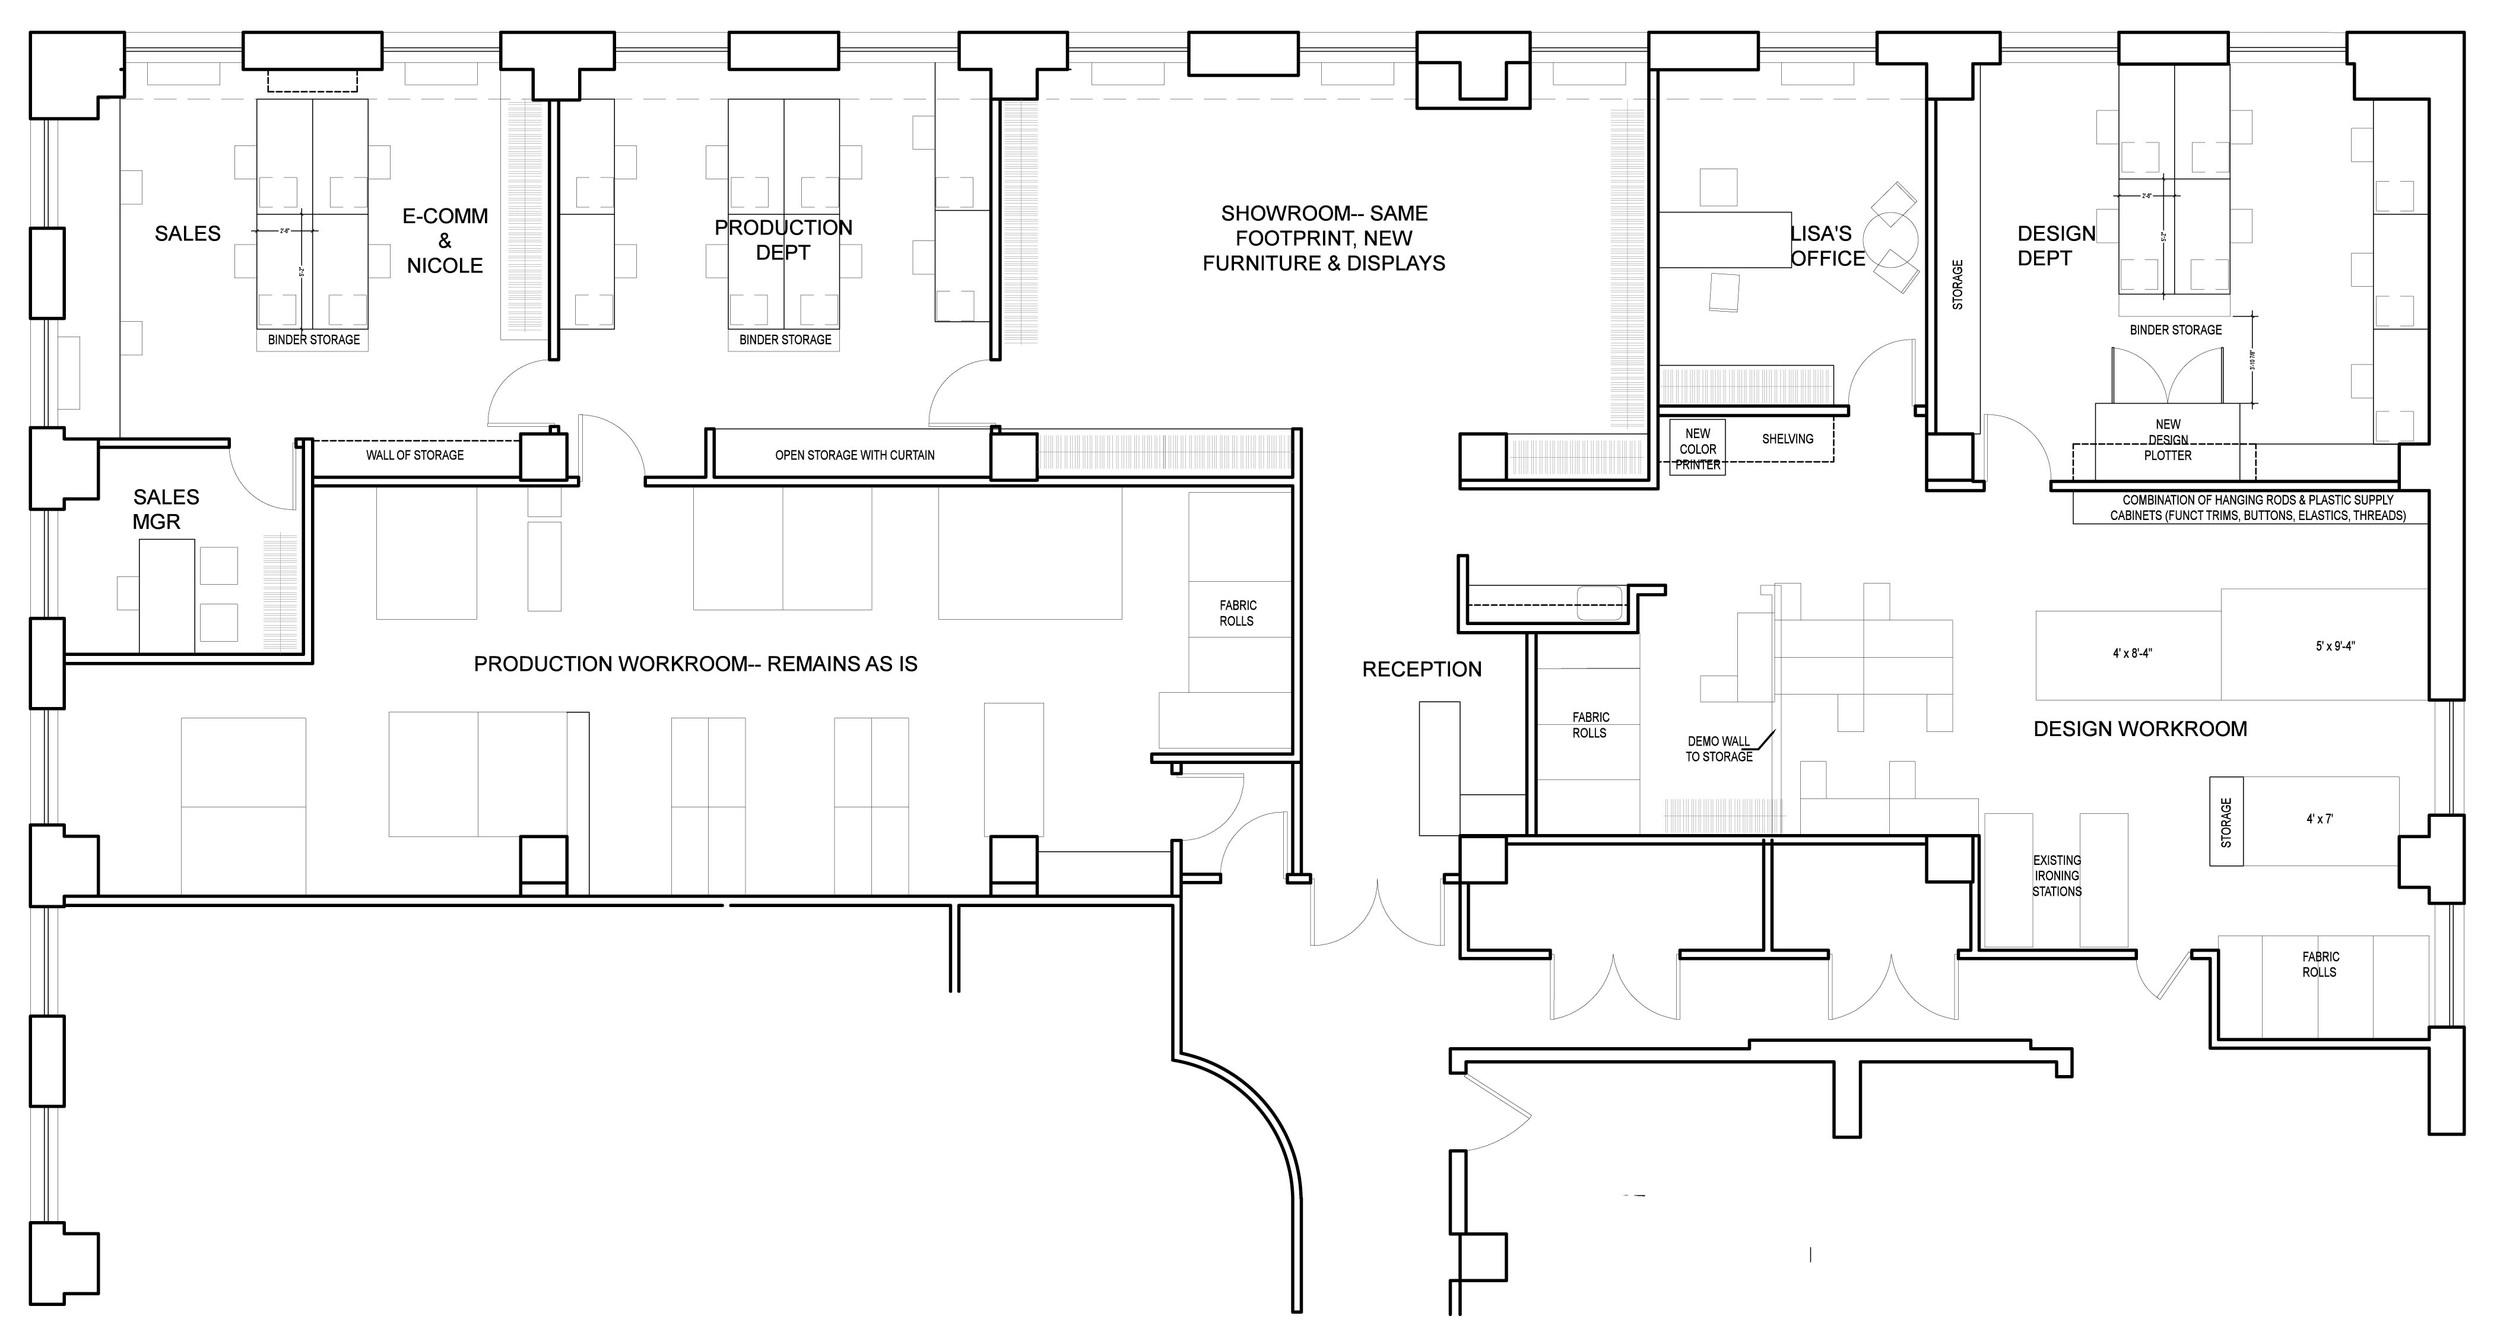 120917_STAY floorplan.jpg